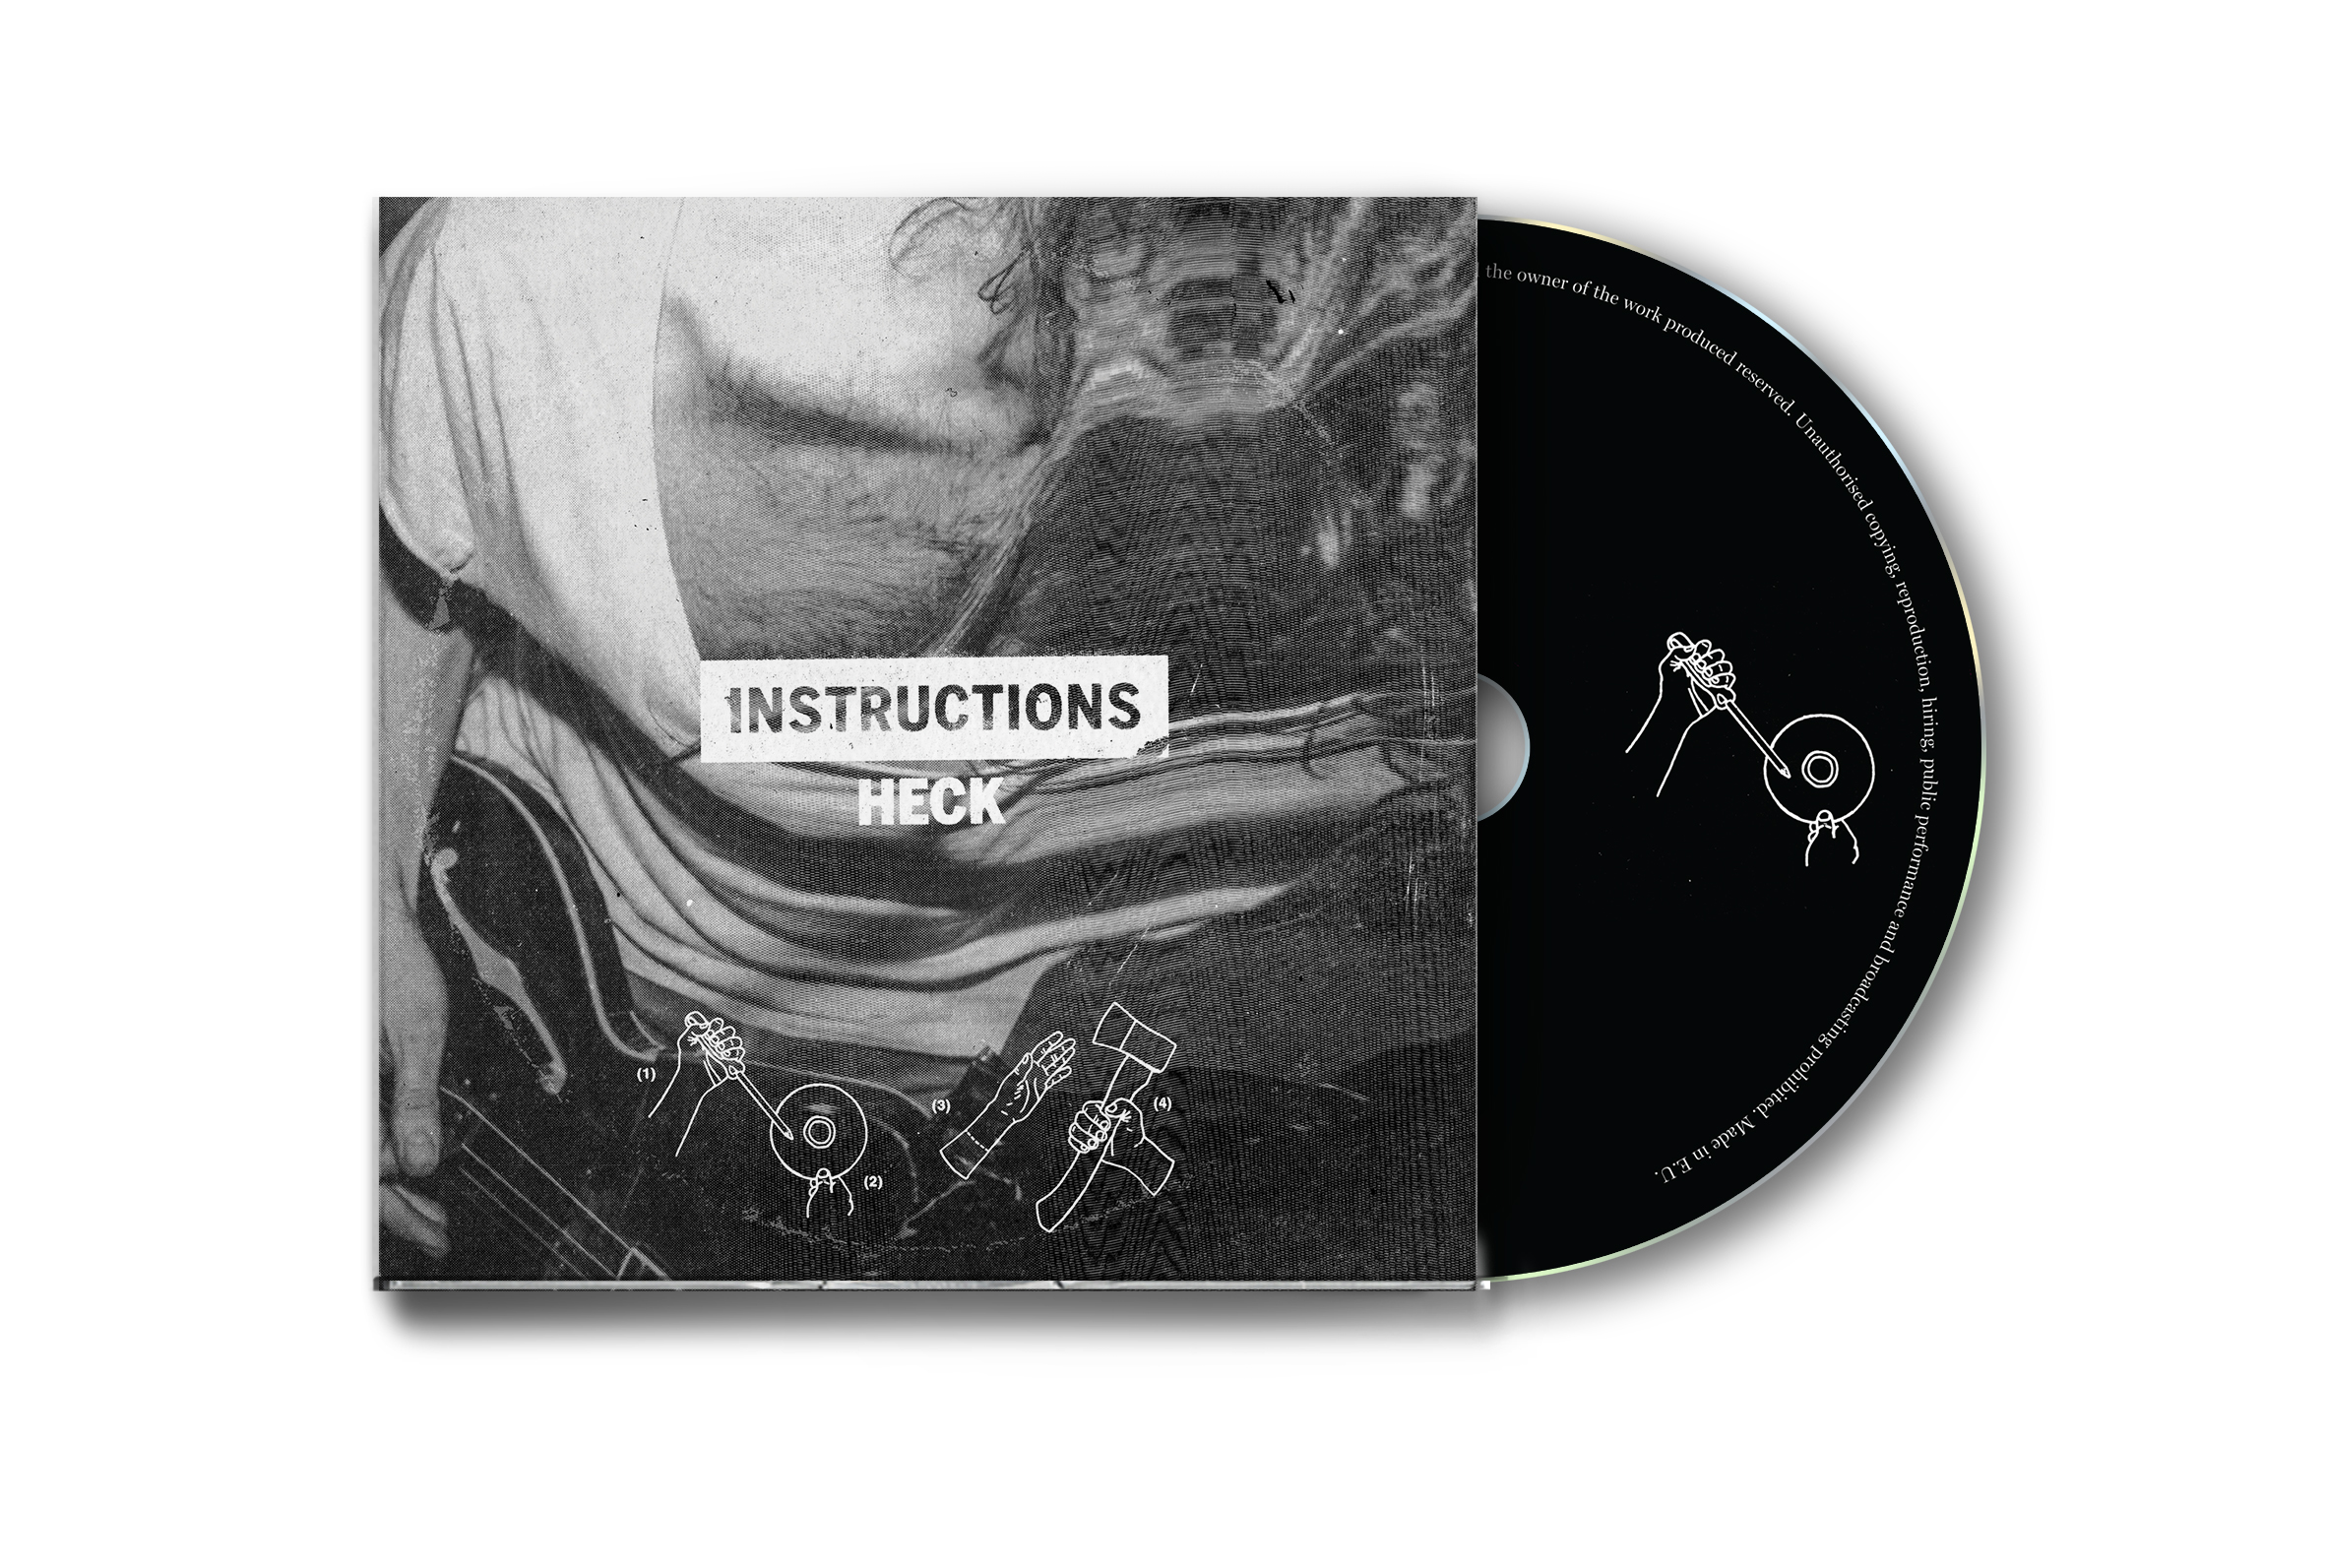 Instructions - CD Digipack